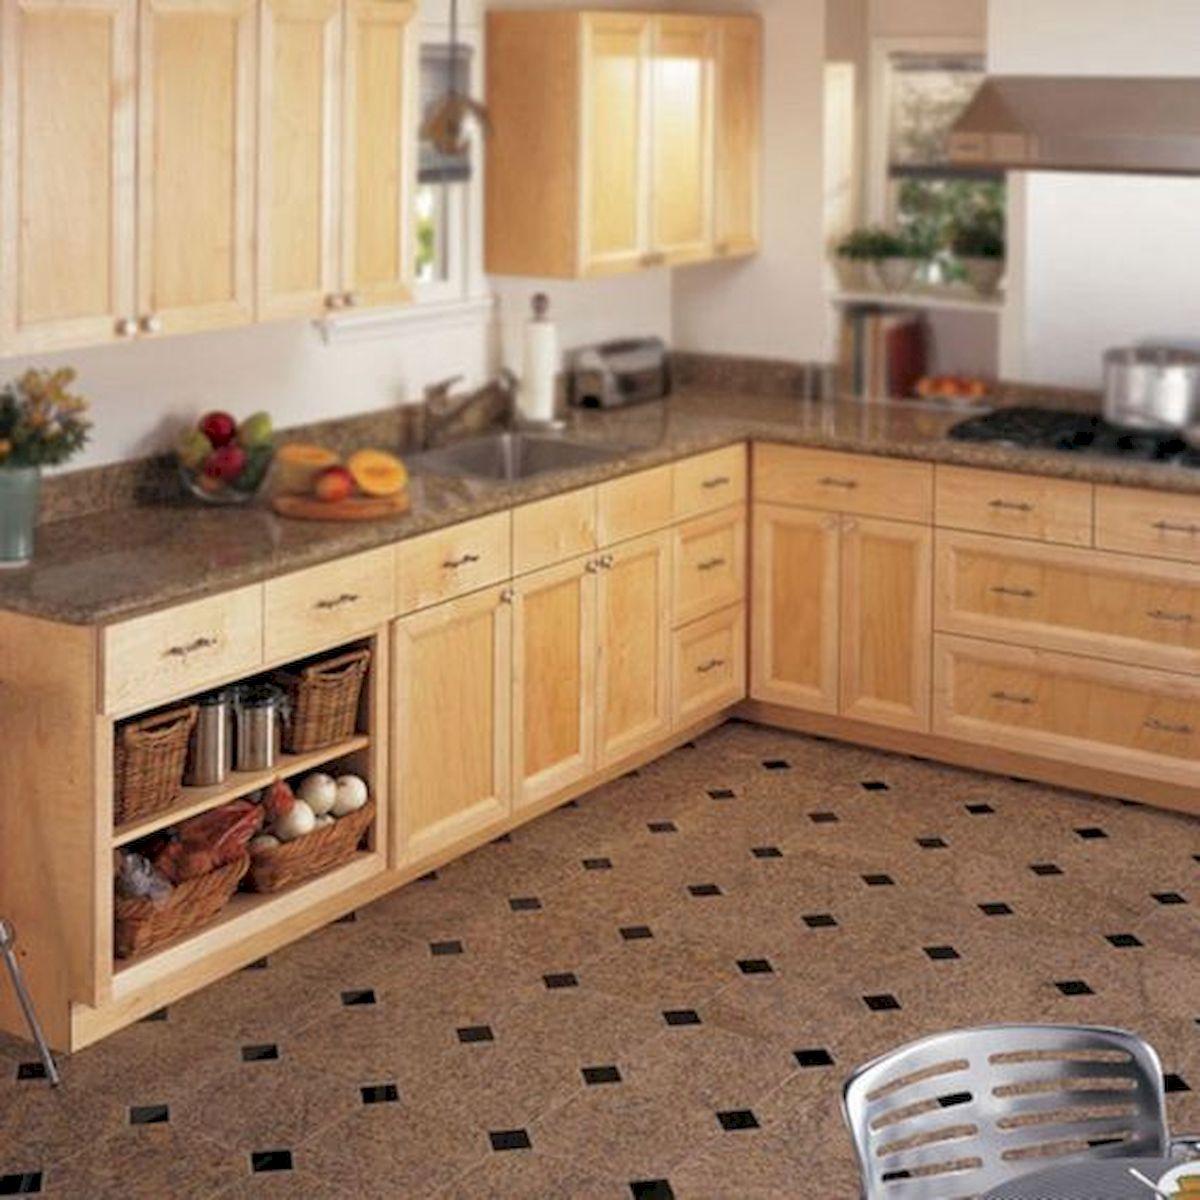 30 Best Kitchen Floor Tile Design Ideas With Concrete Floor Ideas (22)